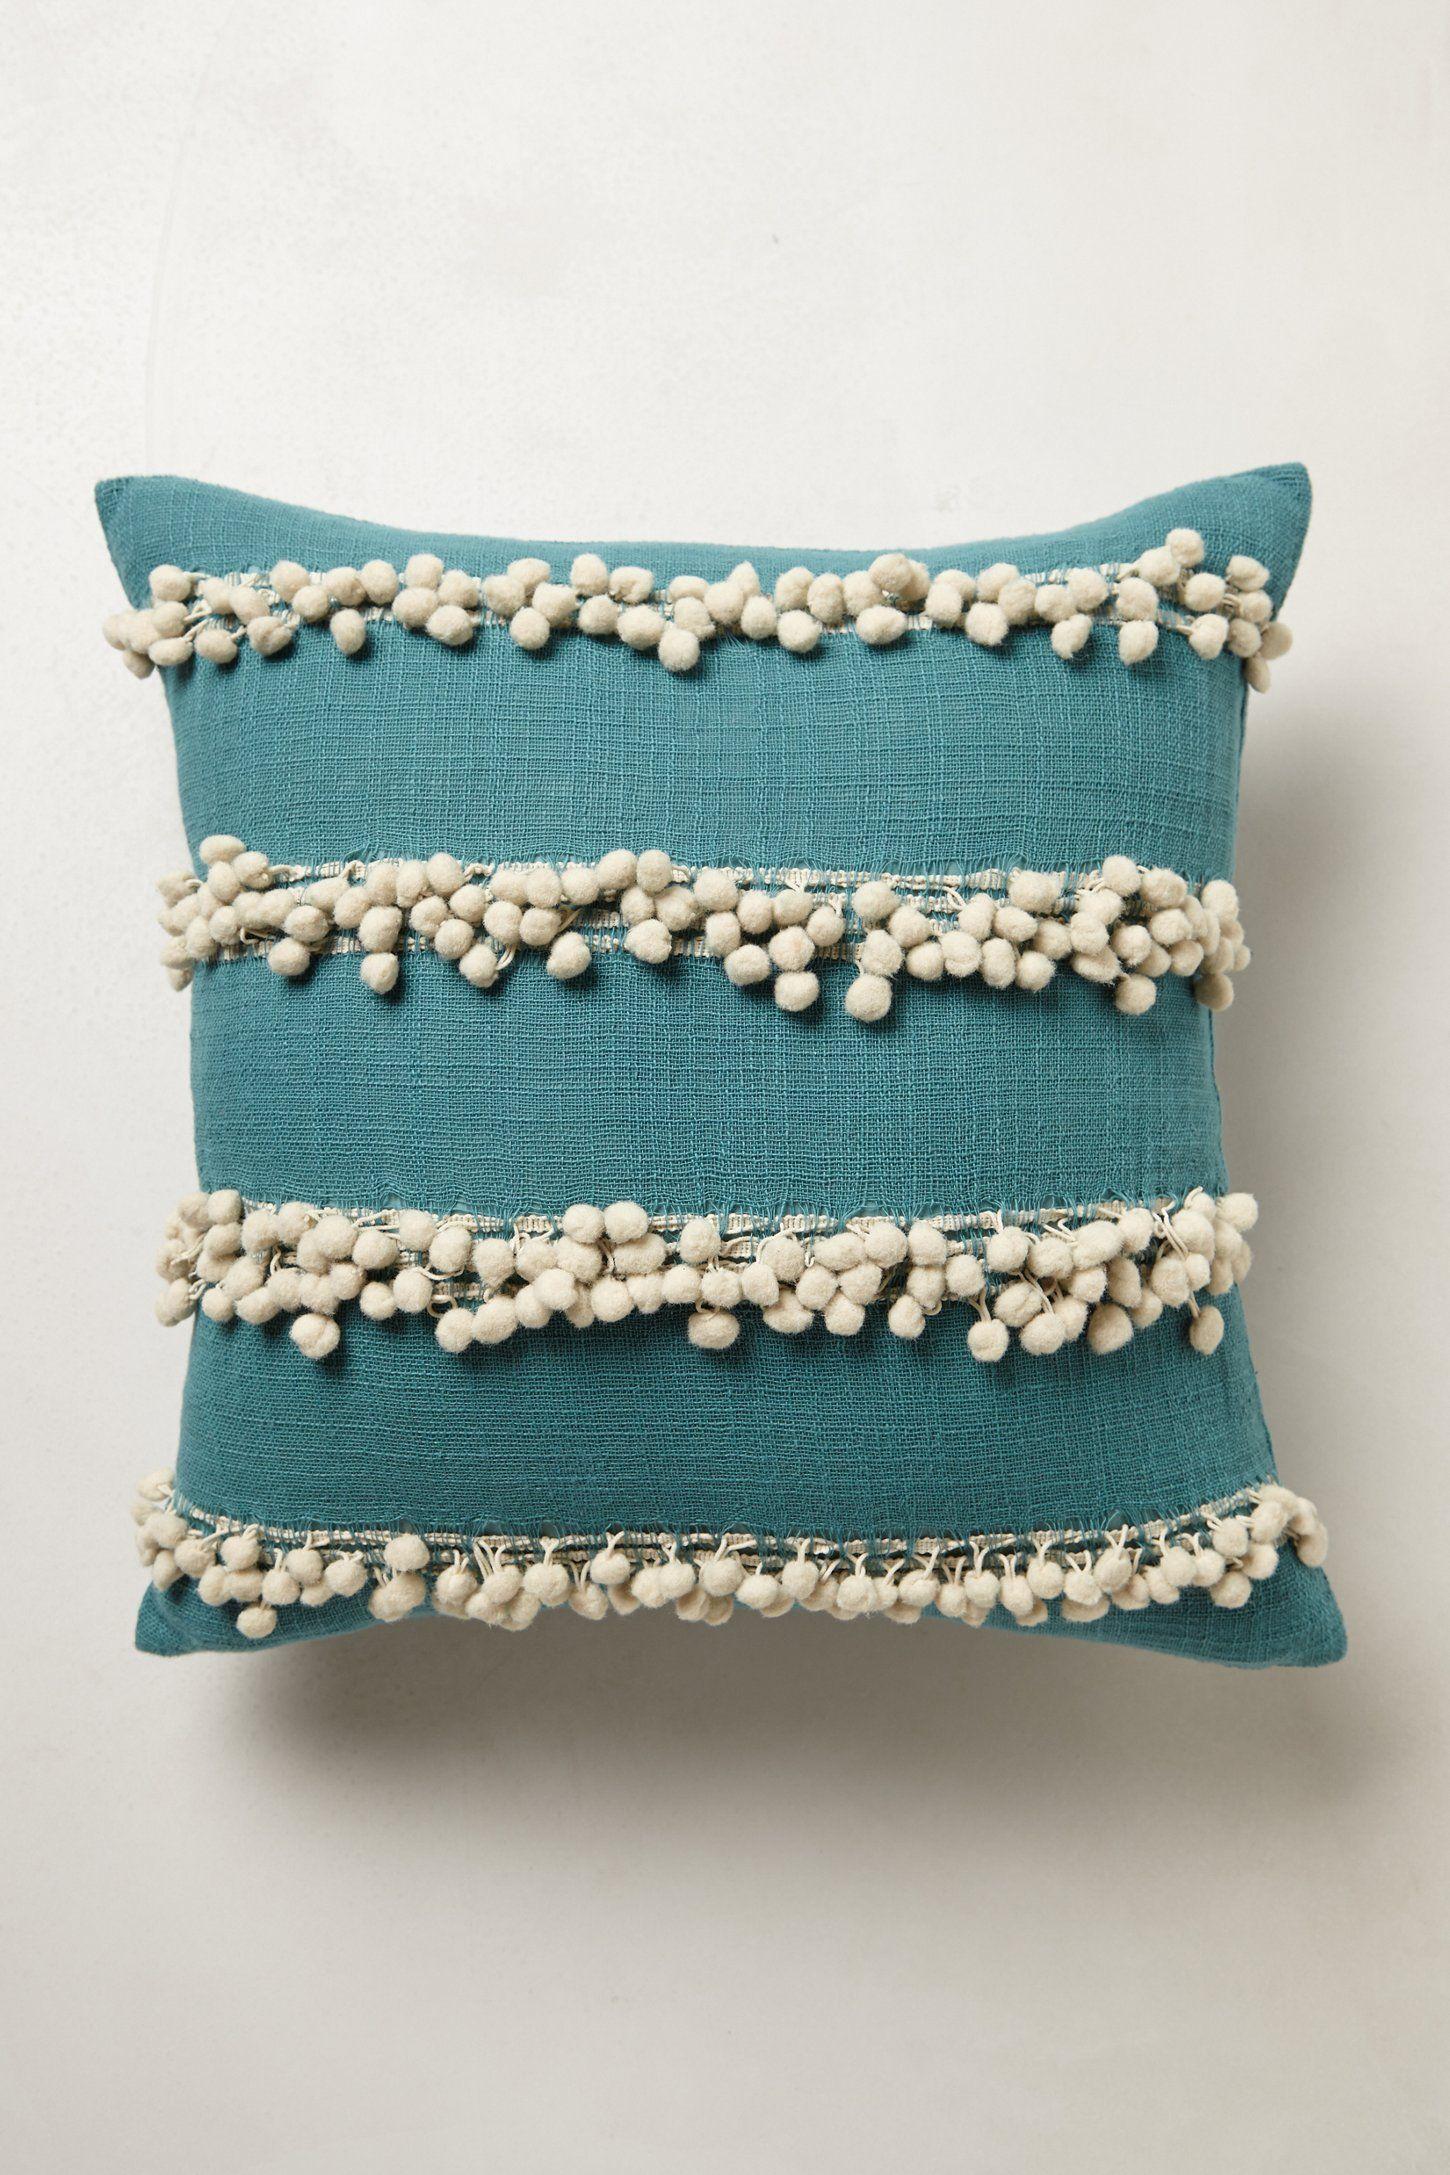 Pillow decorate pinterest pillows diy pillows and cushions